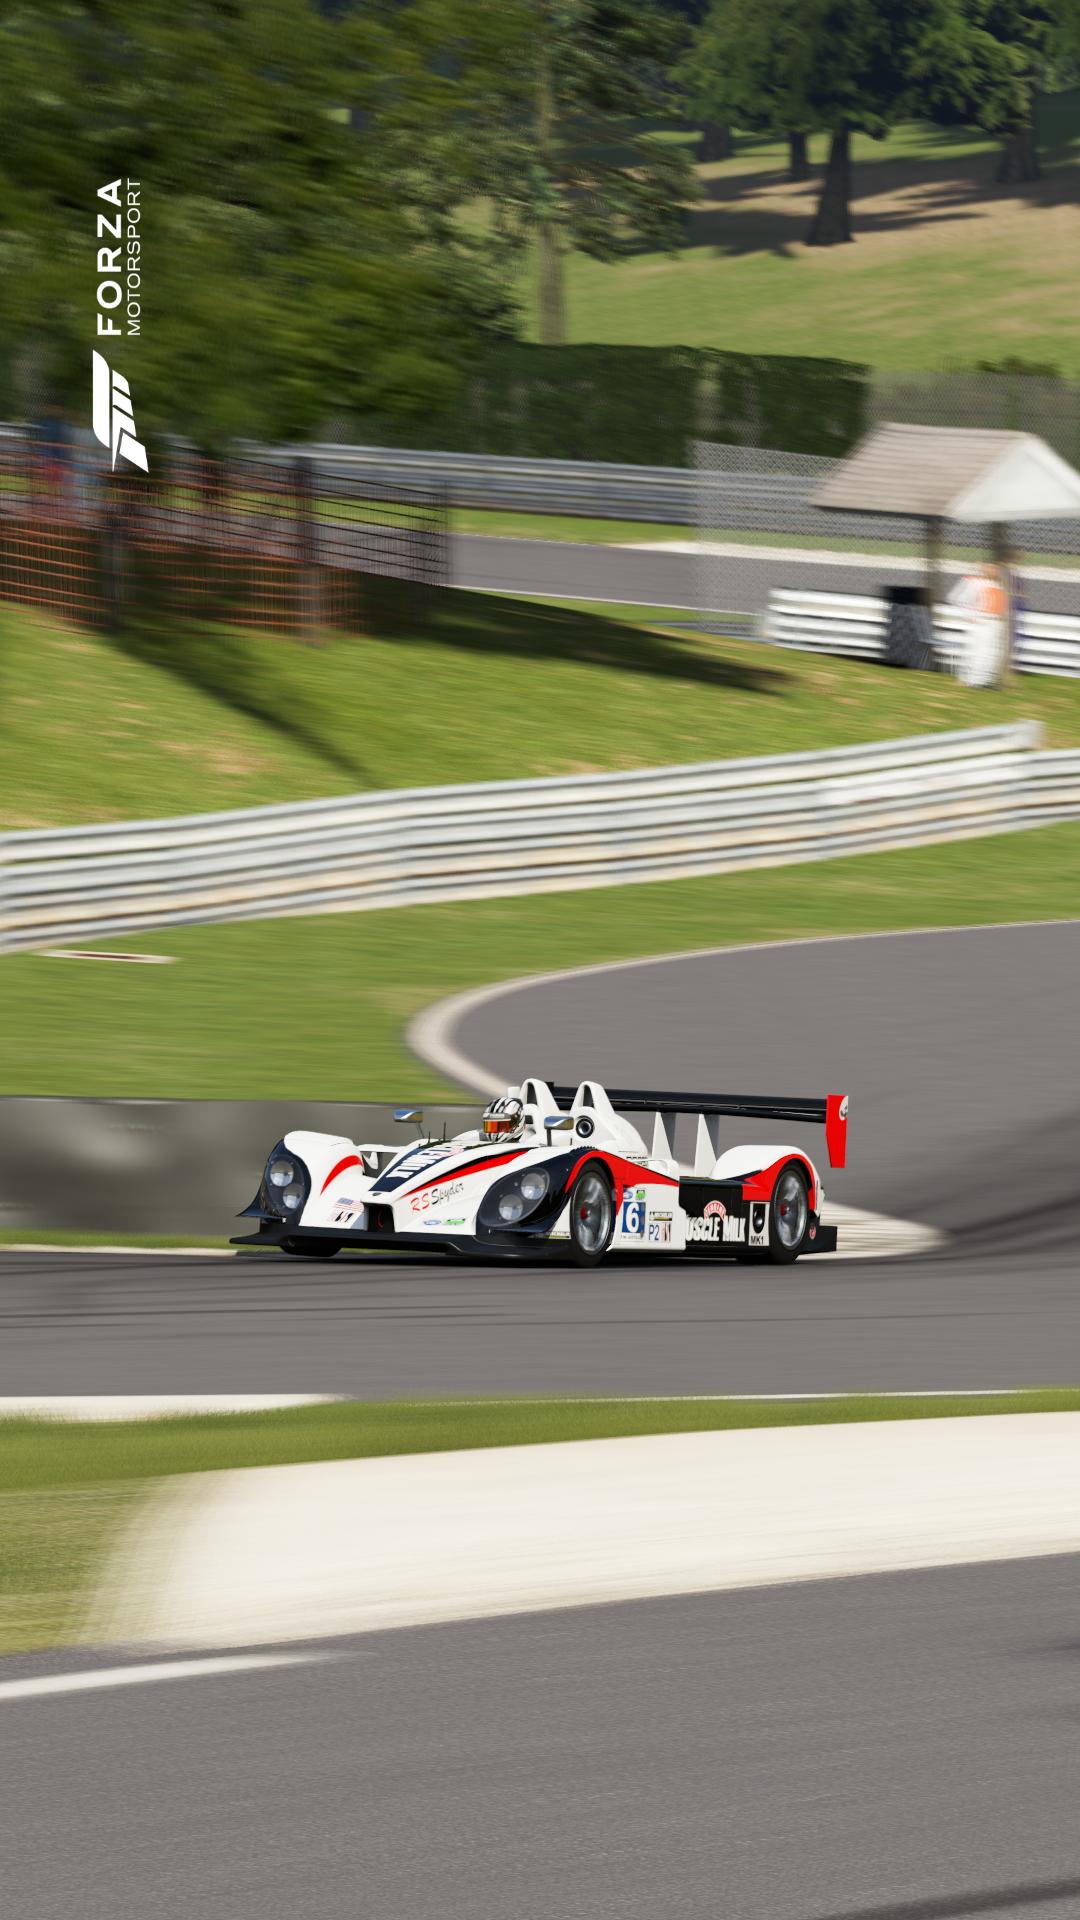 Forza Motorsport 6 (44).png